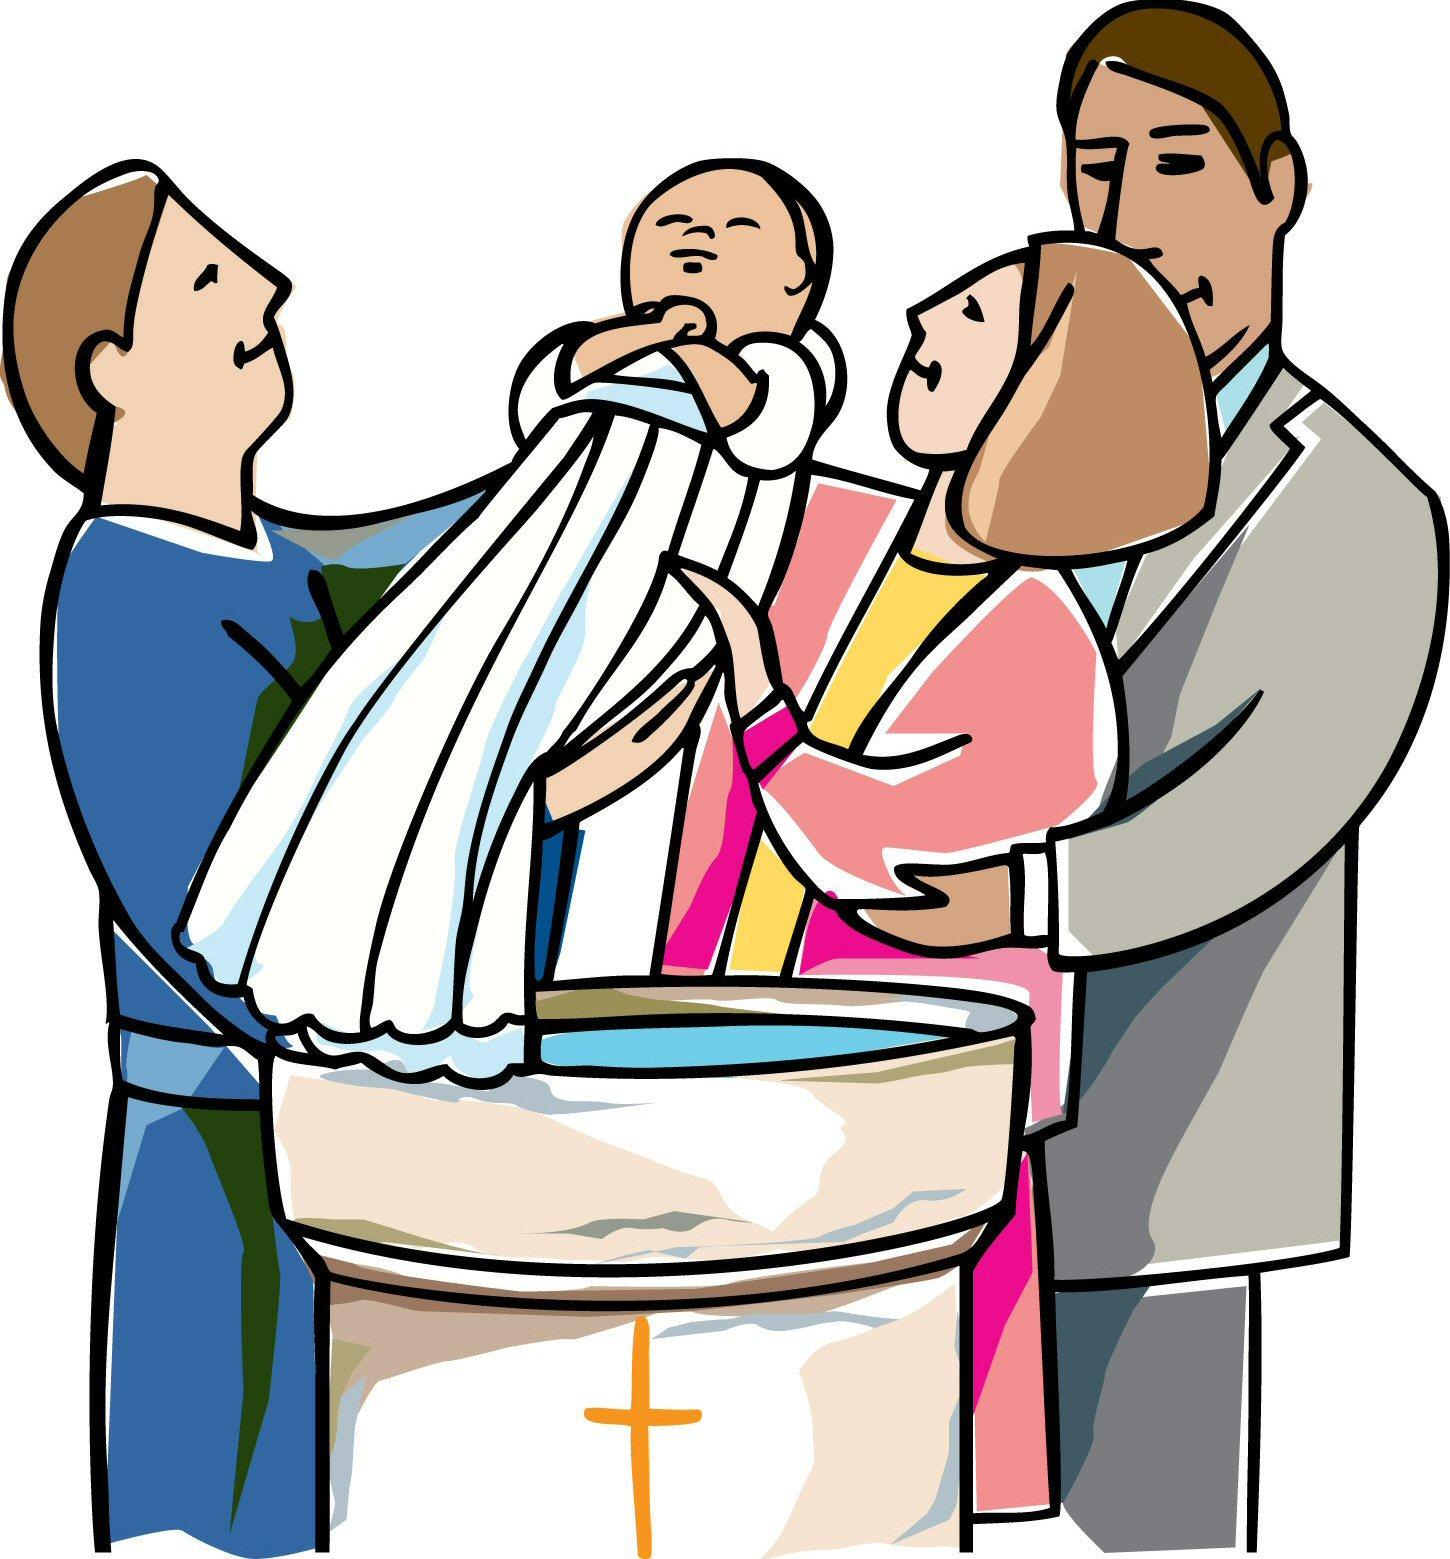 baptism lessons tes teach rh tes com clipart baptism of the lord clipart baptism of the lord